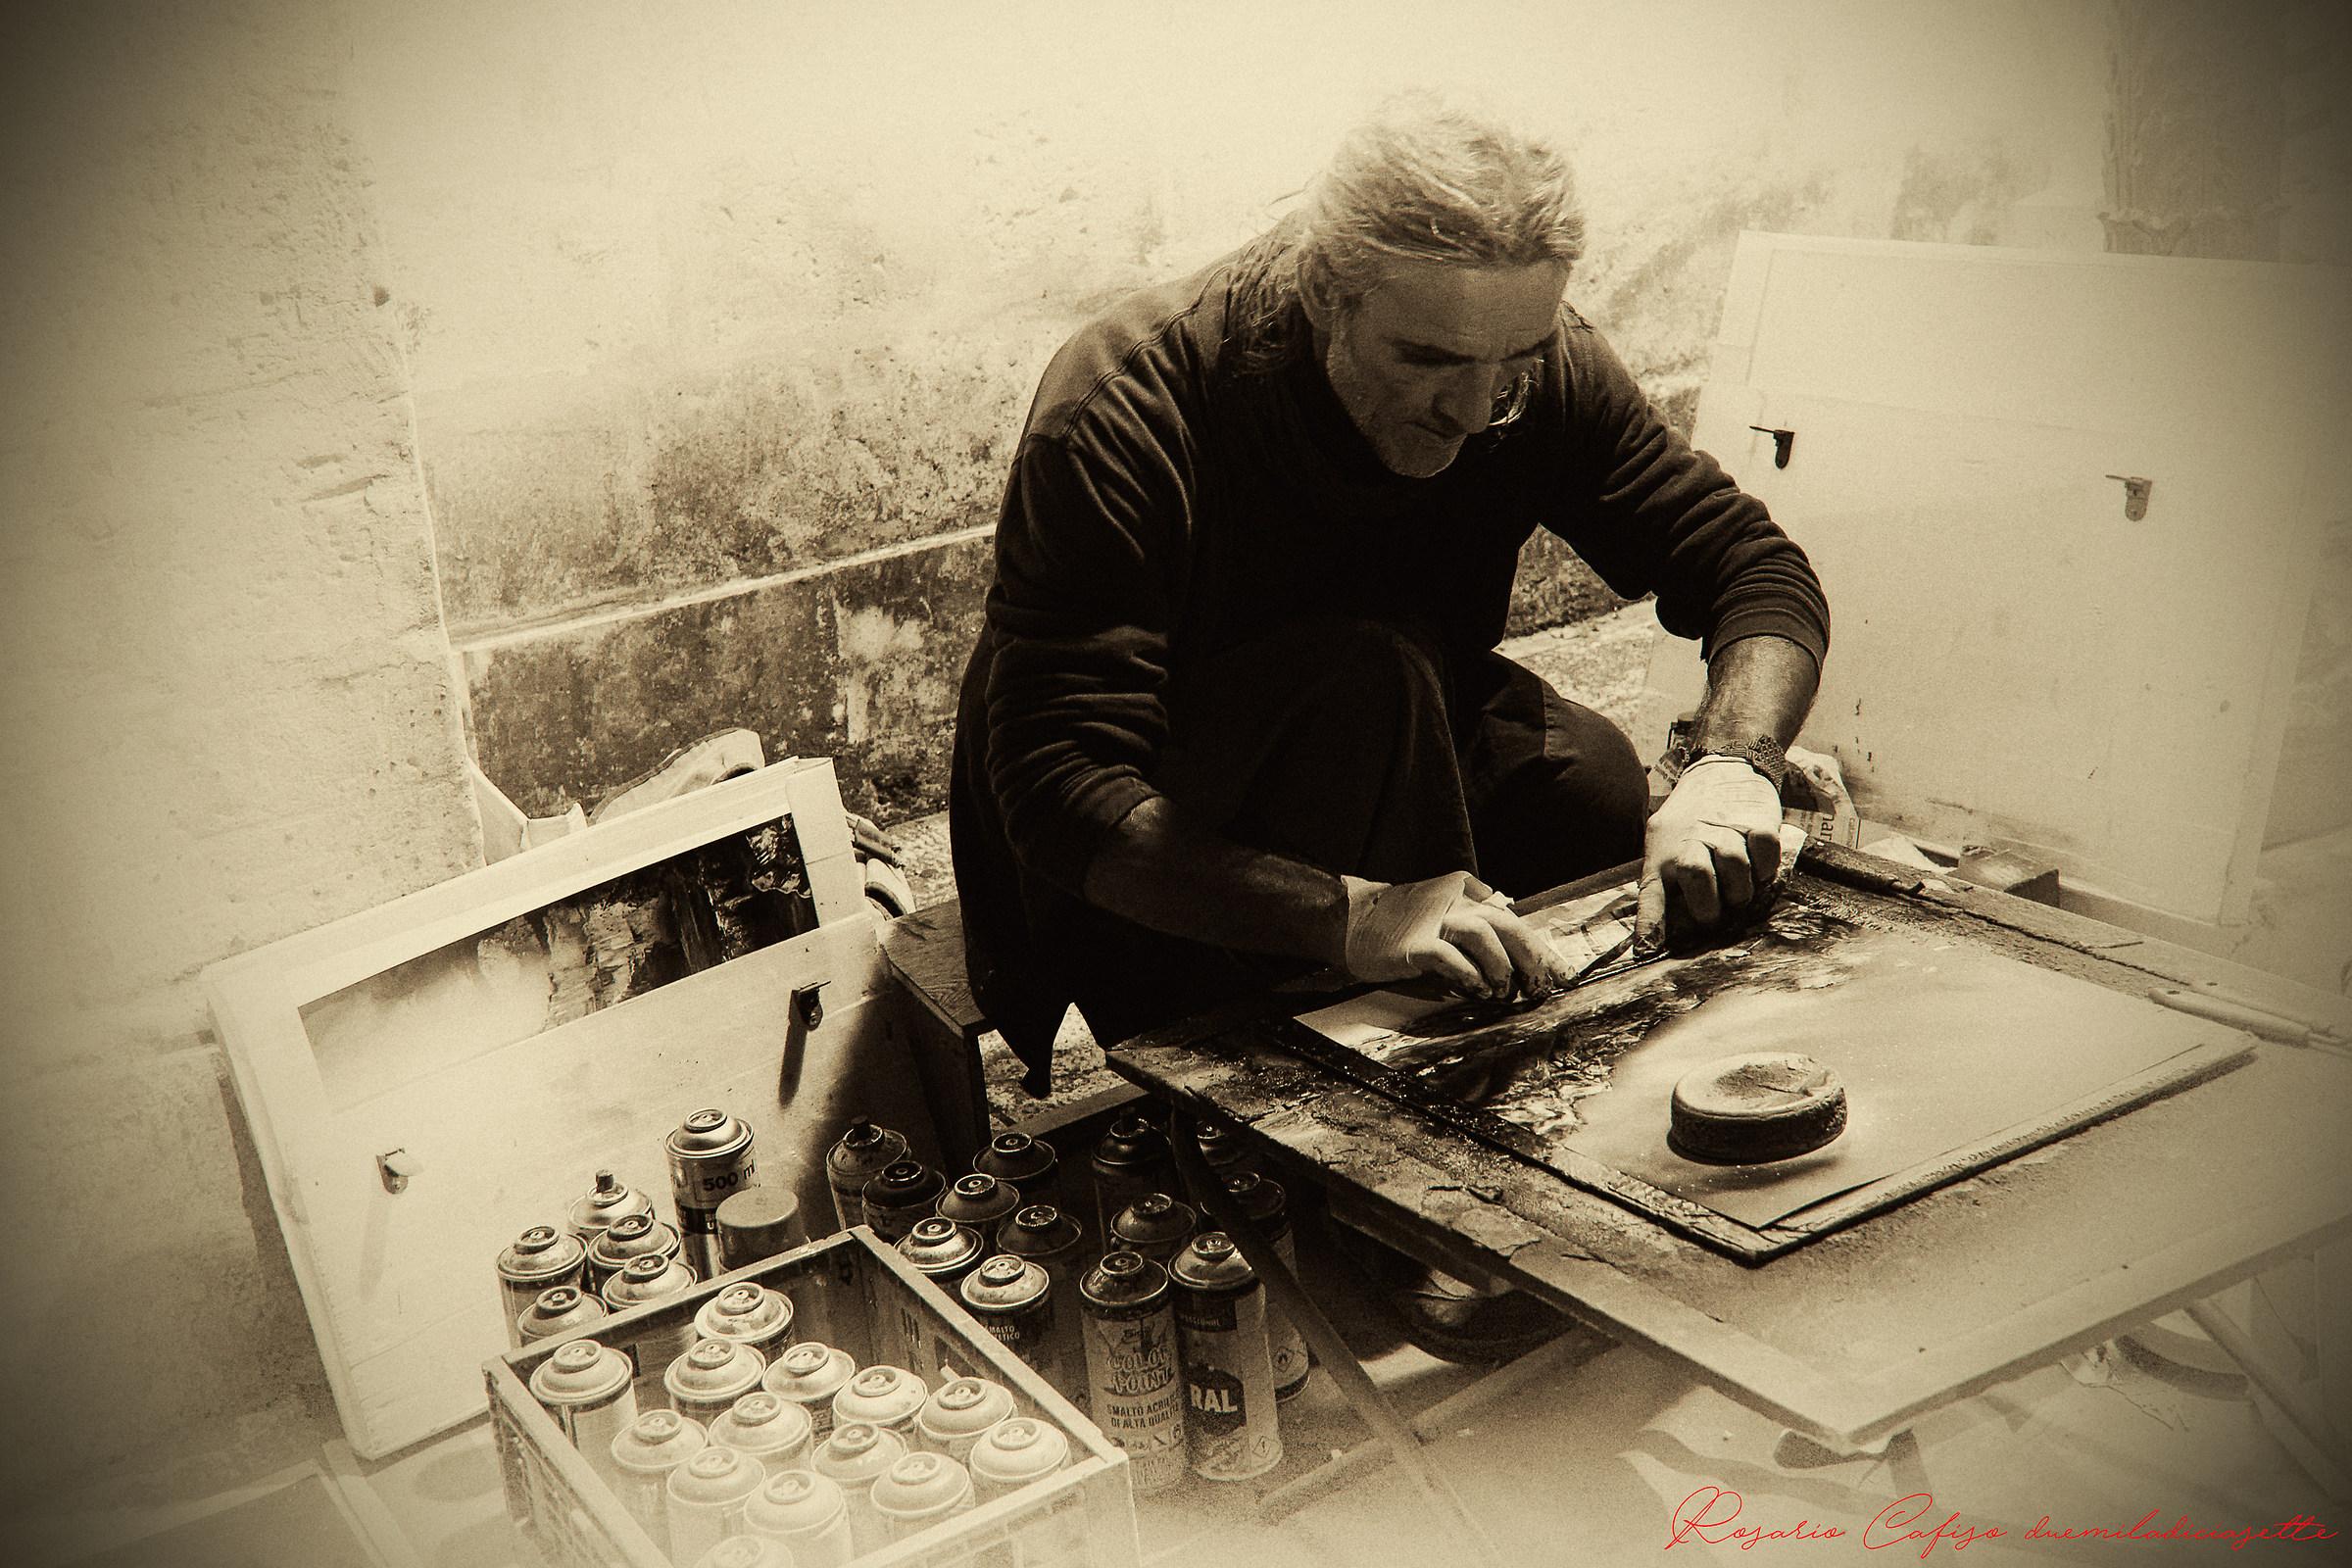 The street artist...